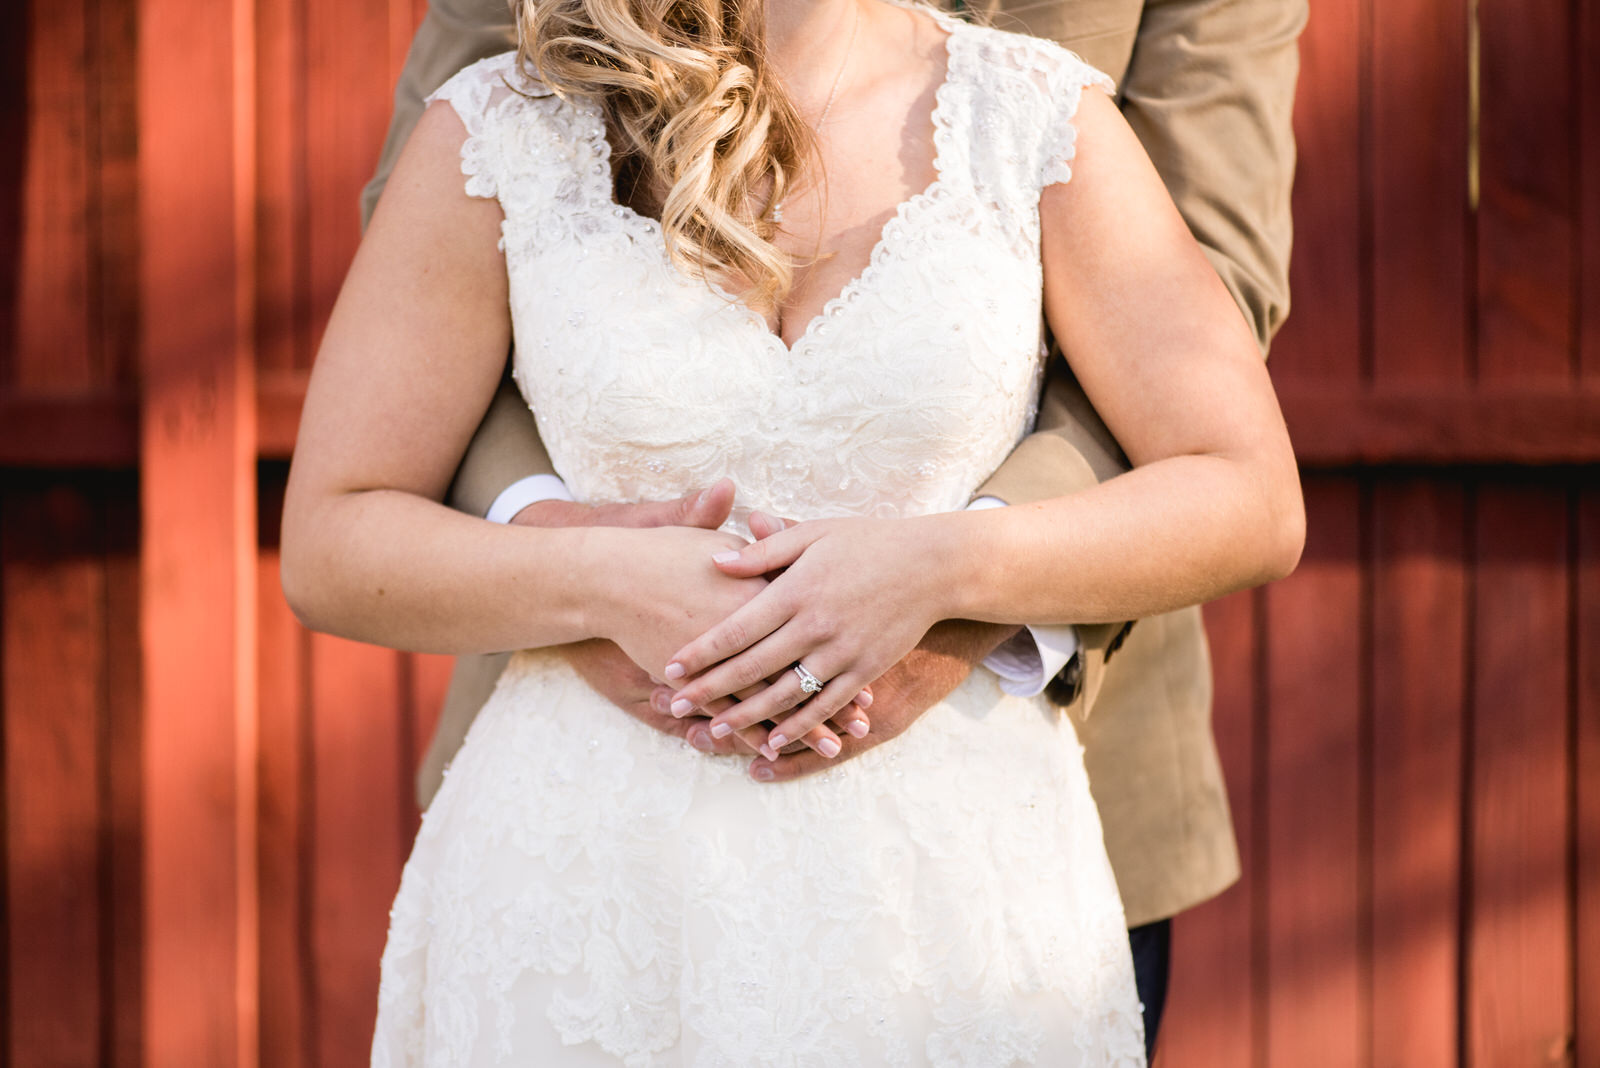 wedding_at_red_fox_winery_wedding_photographer023.jpg